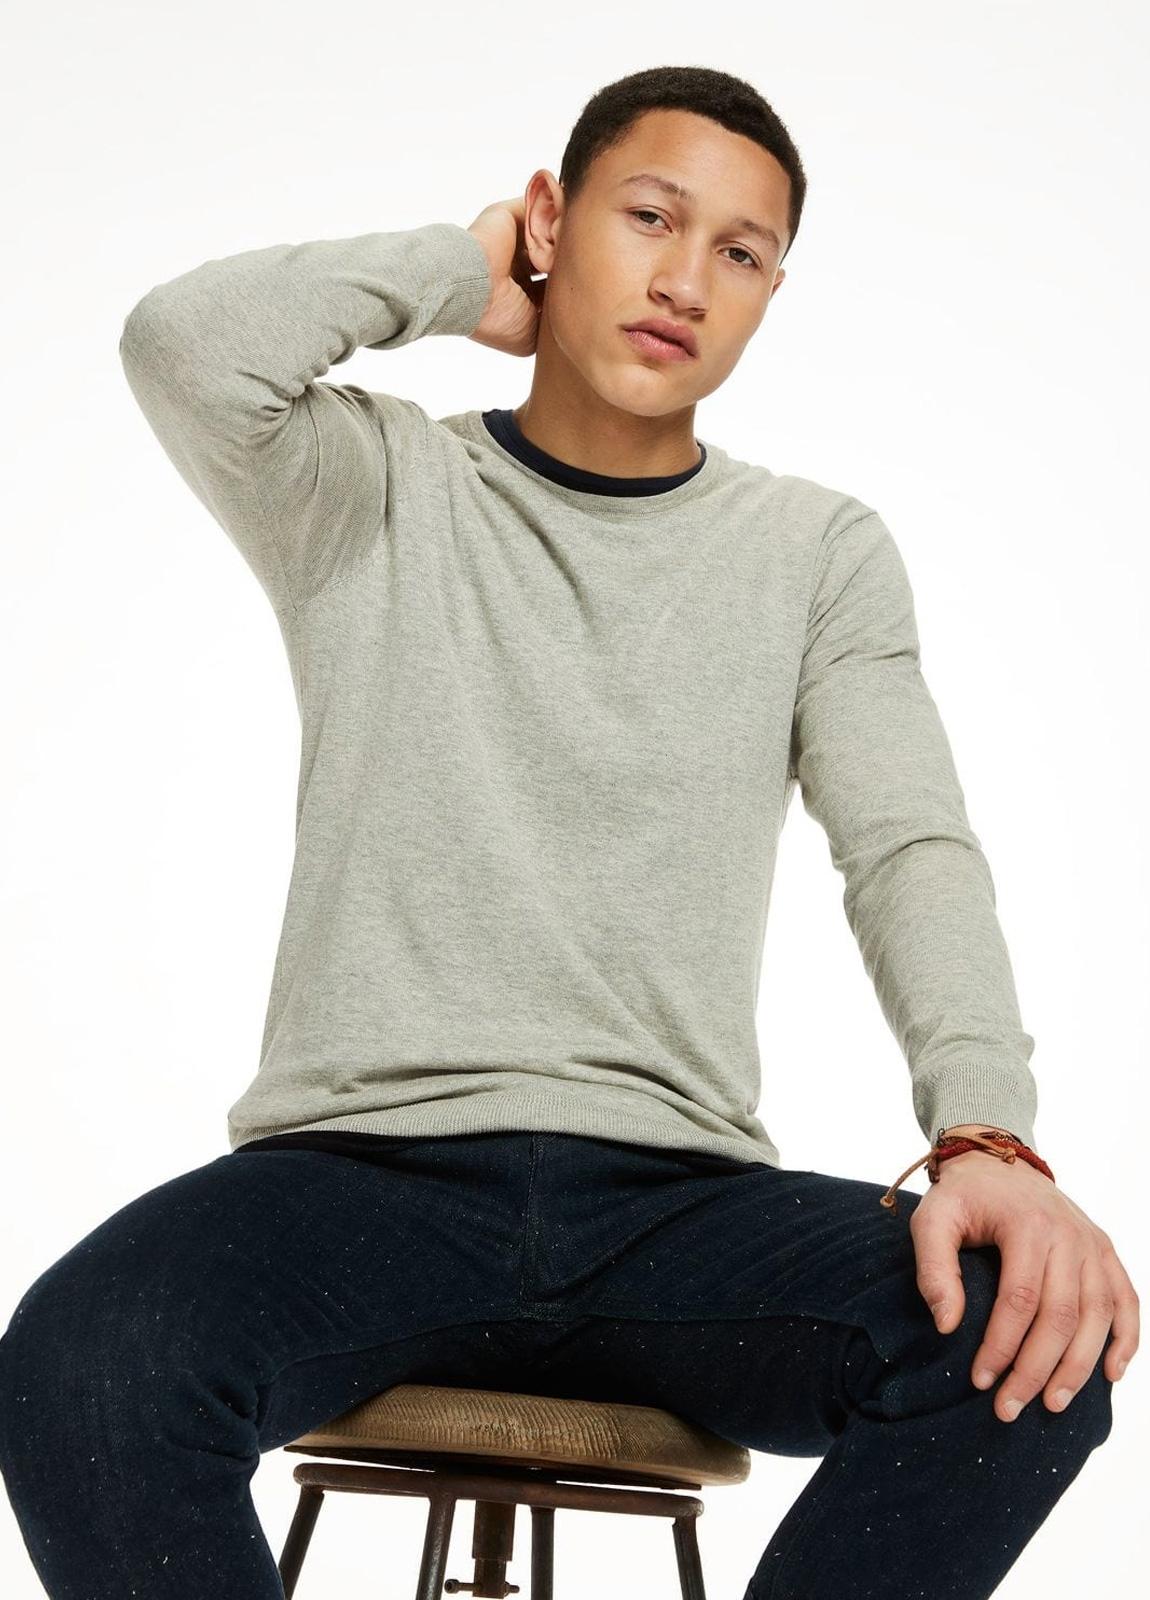 Jersey cuello redondo color gris. 95% Algodón 5% Cashmere. - Ítem1